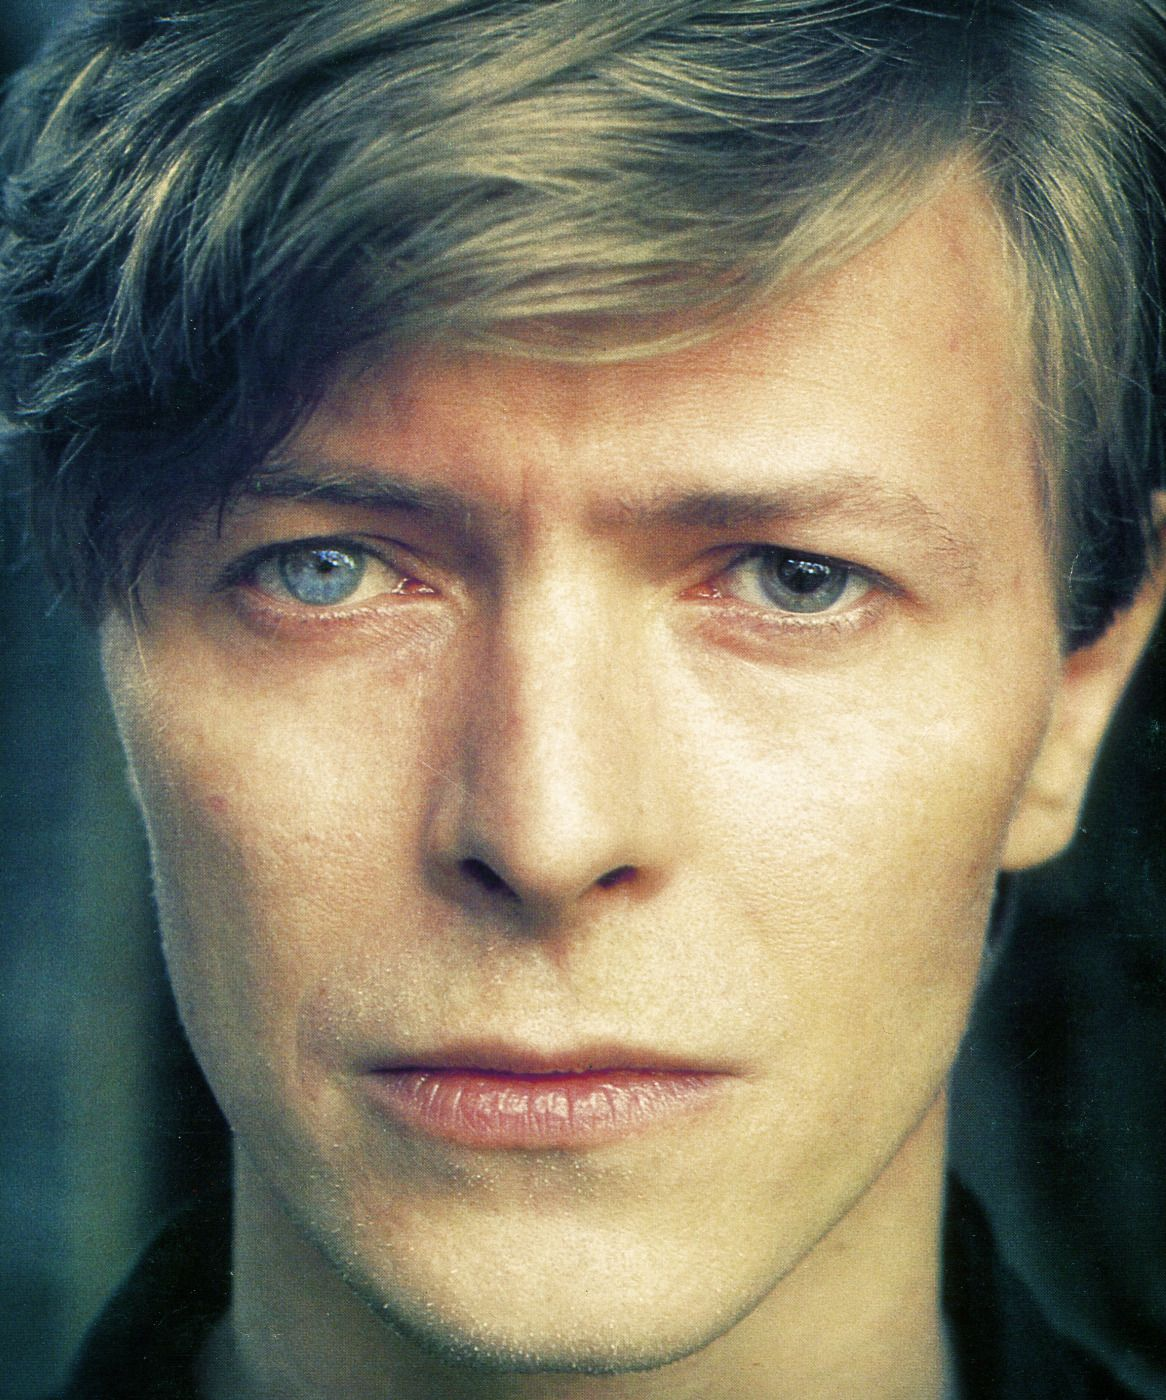 David Bowie David Bowie Bowie Eyes Bowie